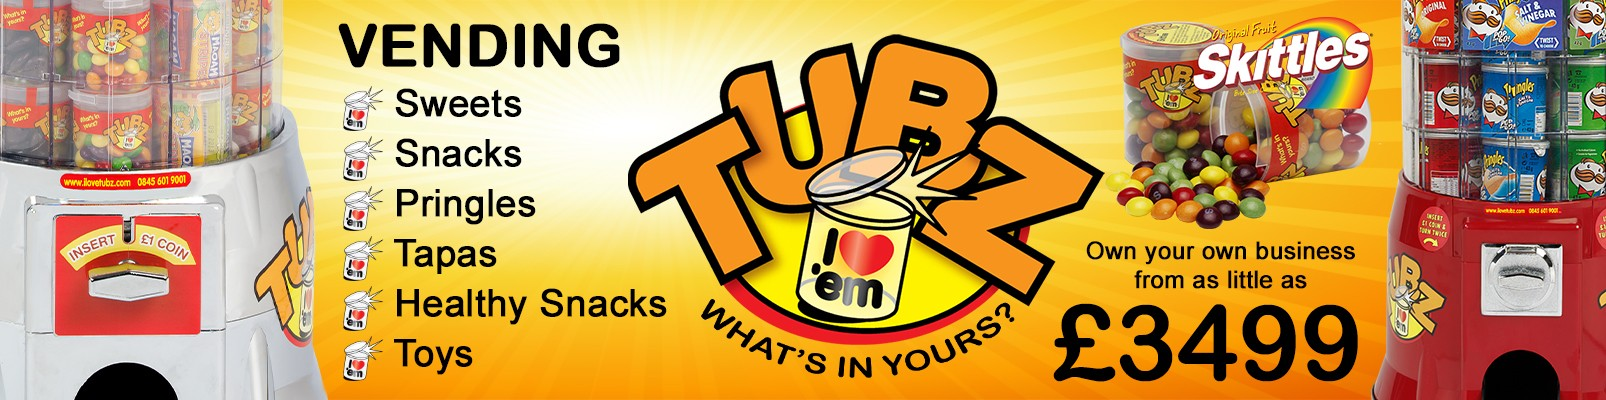 Tubz Banner Image